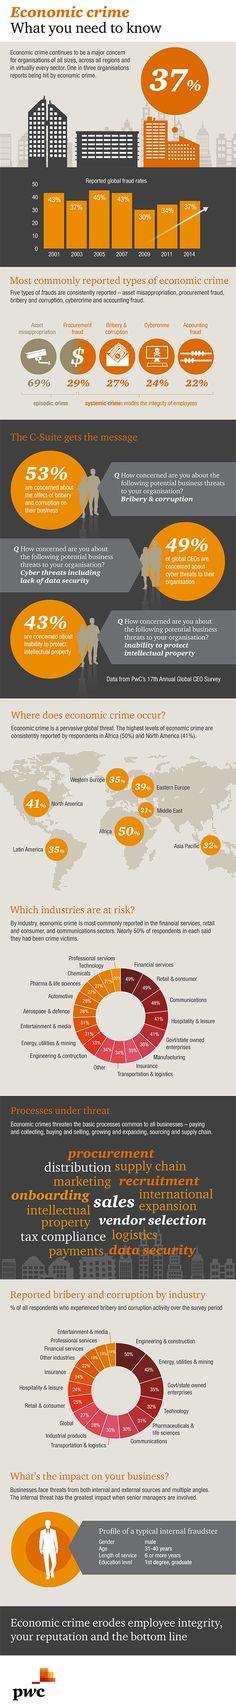 Infographic PwC: Global Economic Crime survey 2014.